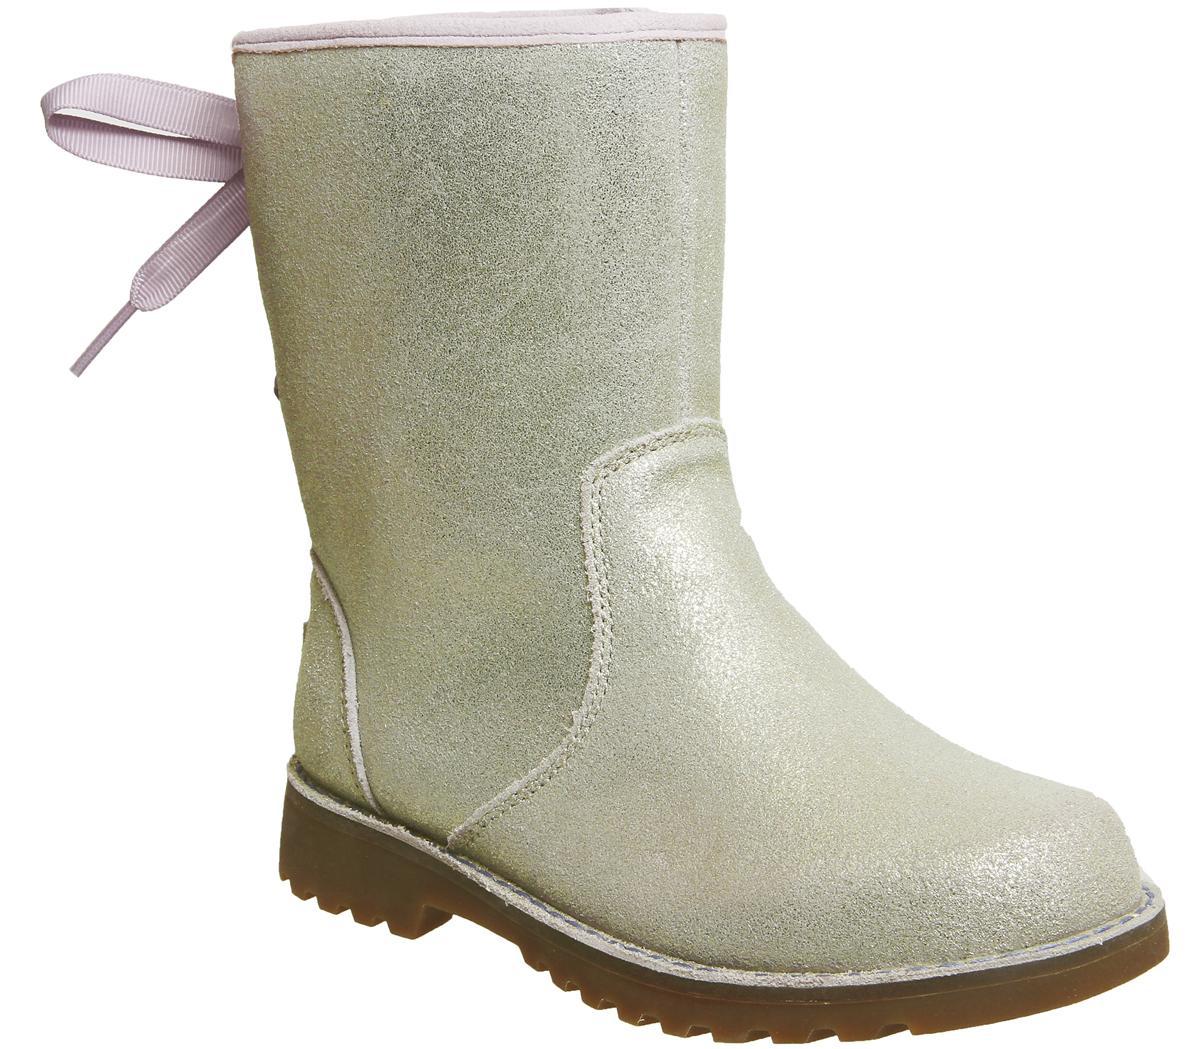 Corene Kids Boots